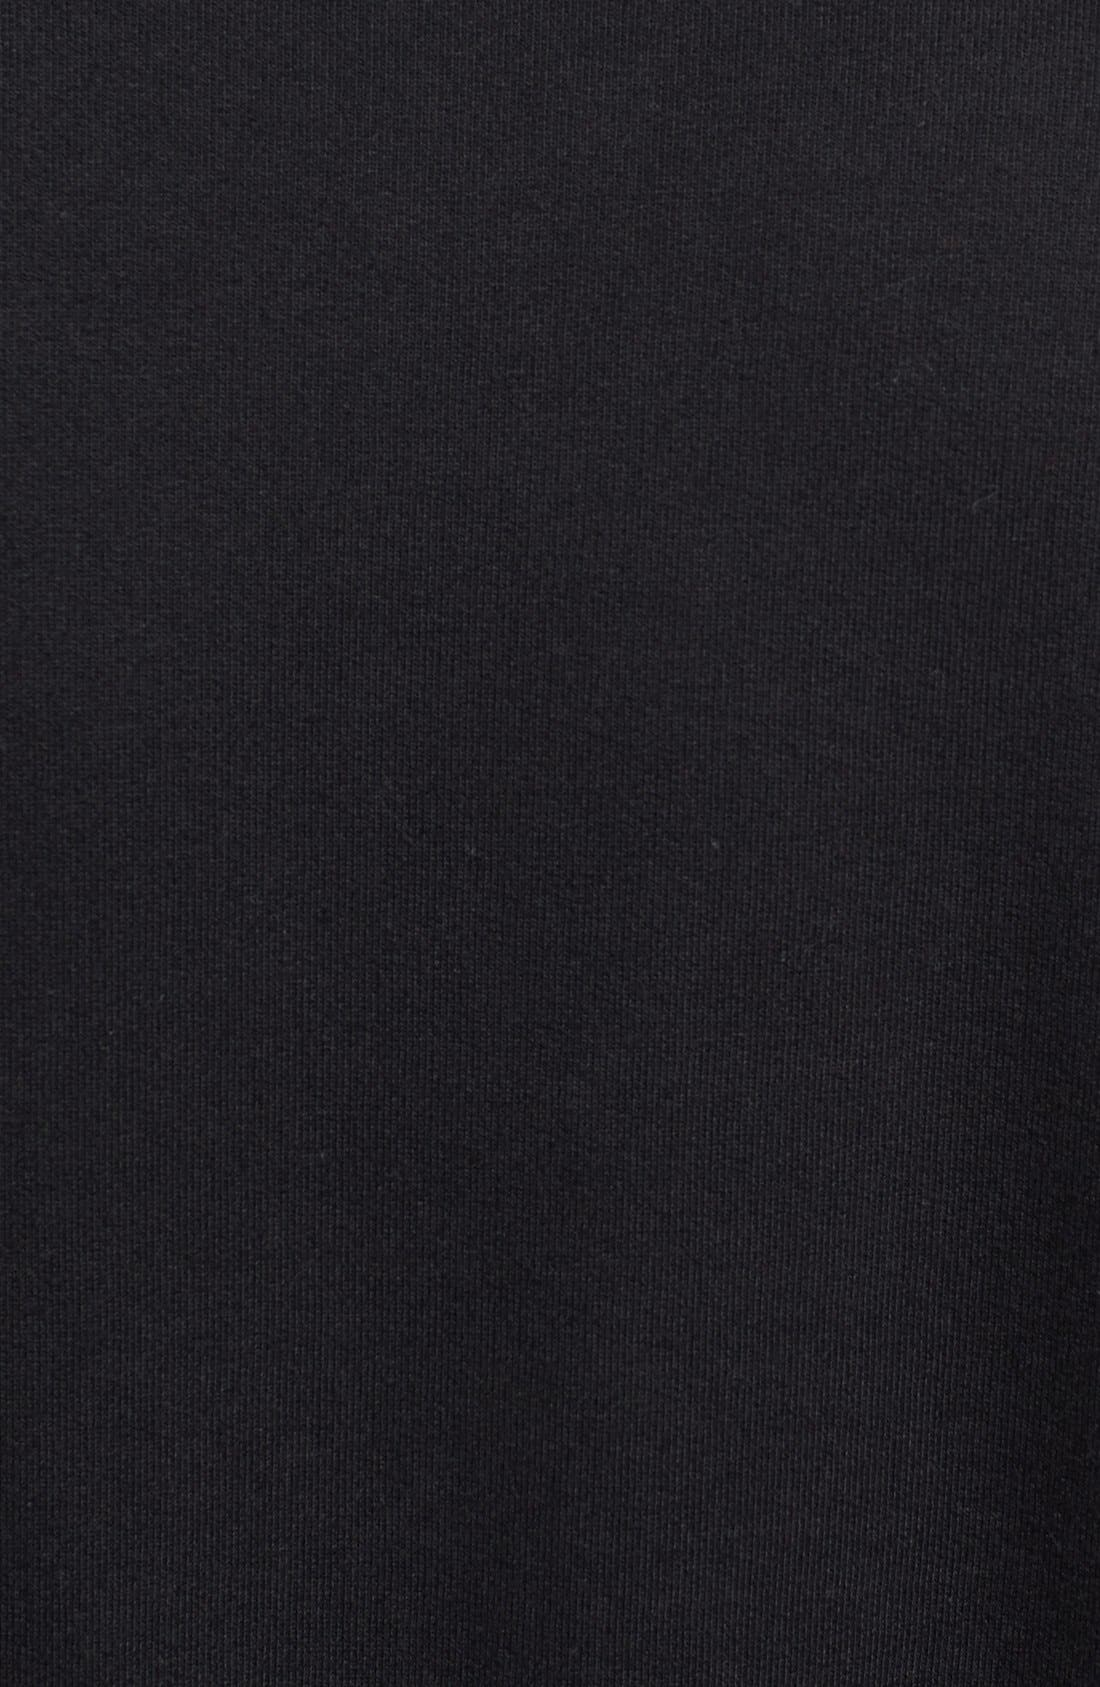 Alternate Image 3  - ZANEROBE 'Primal' Crewneck Sweatshirt with Suede Sleeves